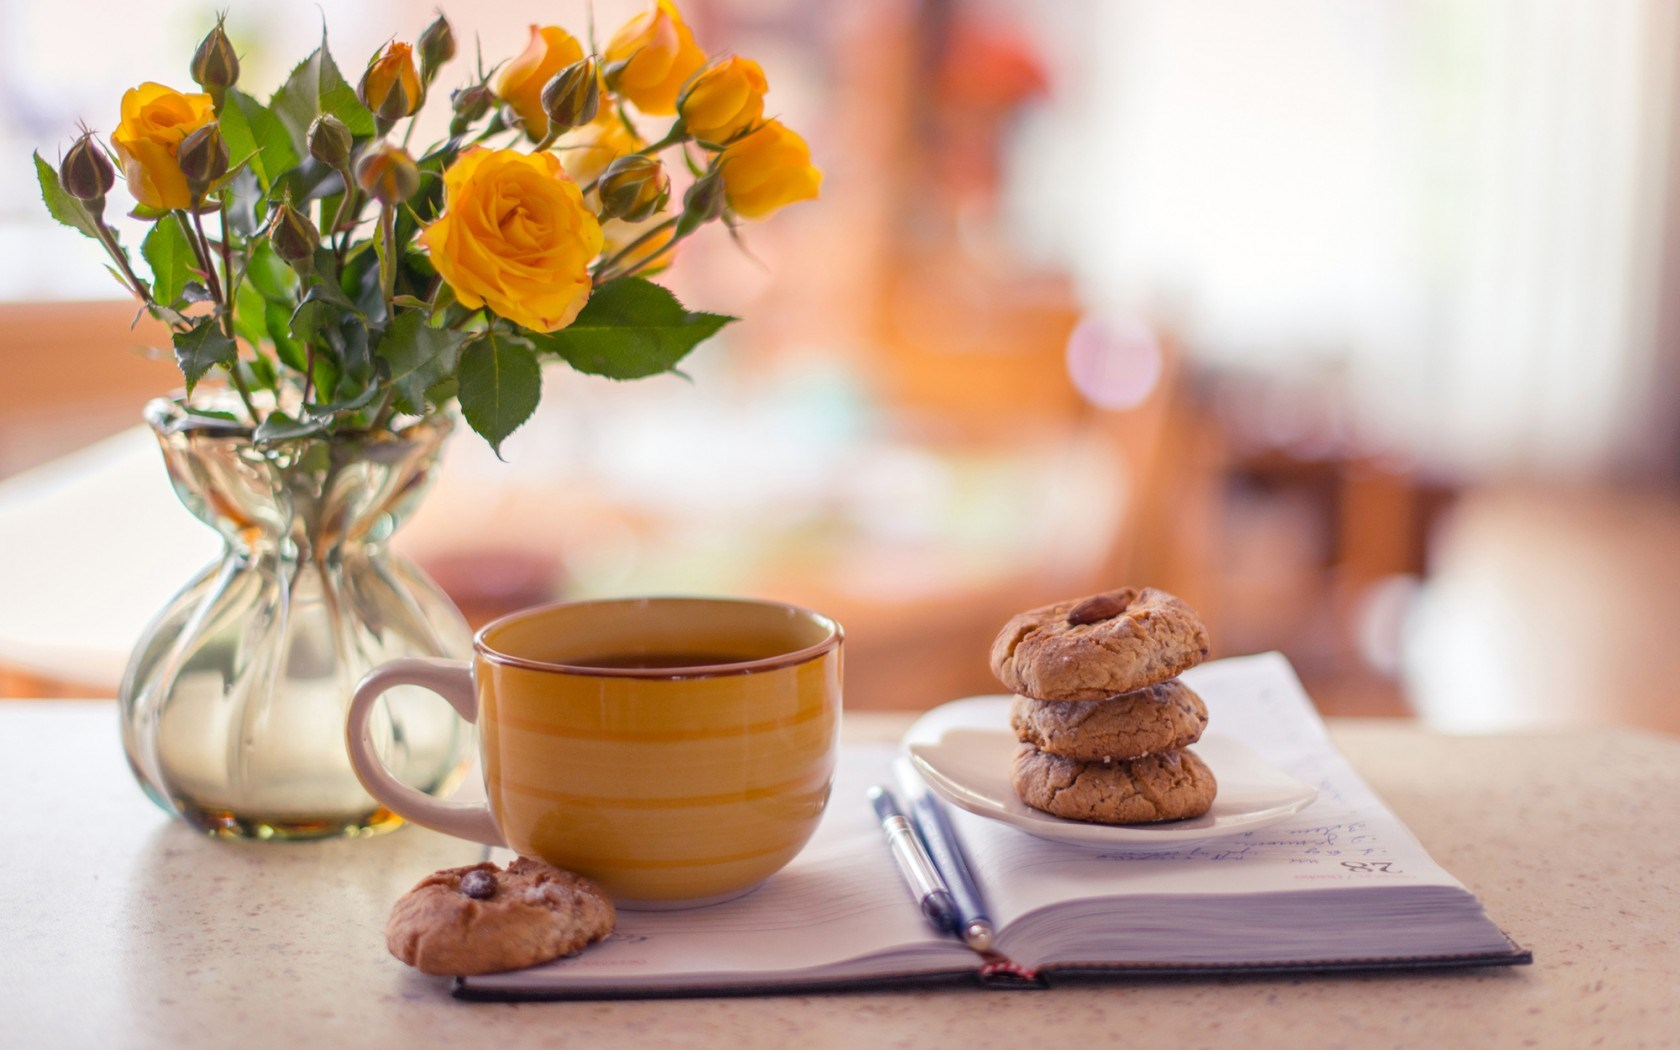 pretty-tea-cup-wallpaper-42213-43207-hd-wallpapers.jpg